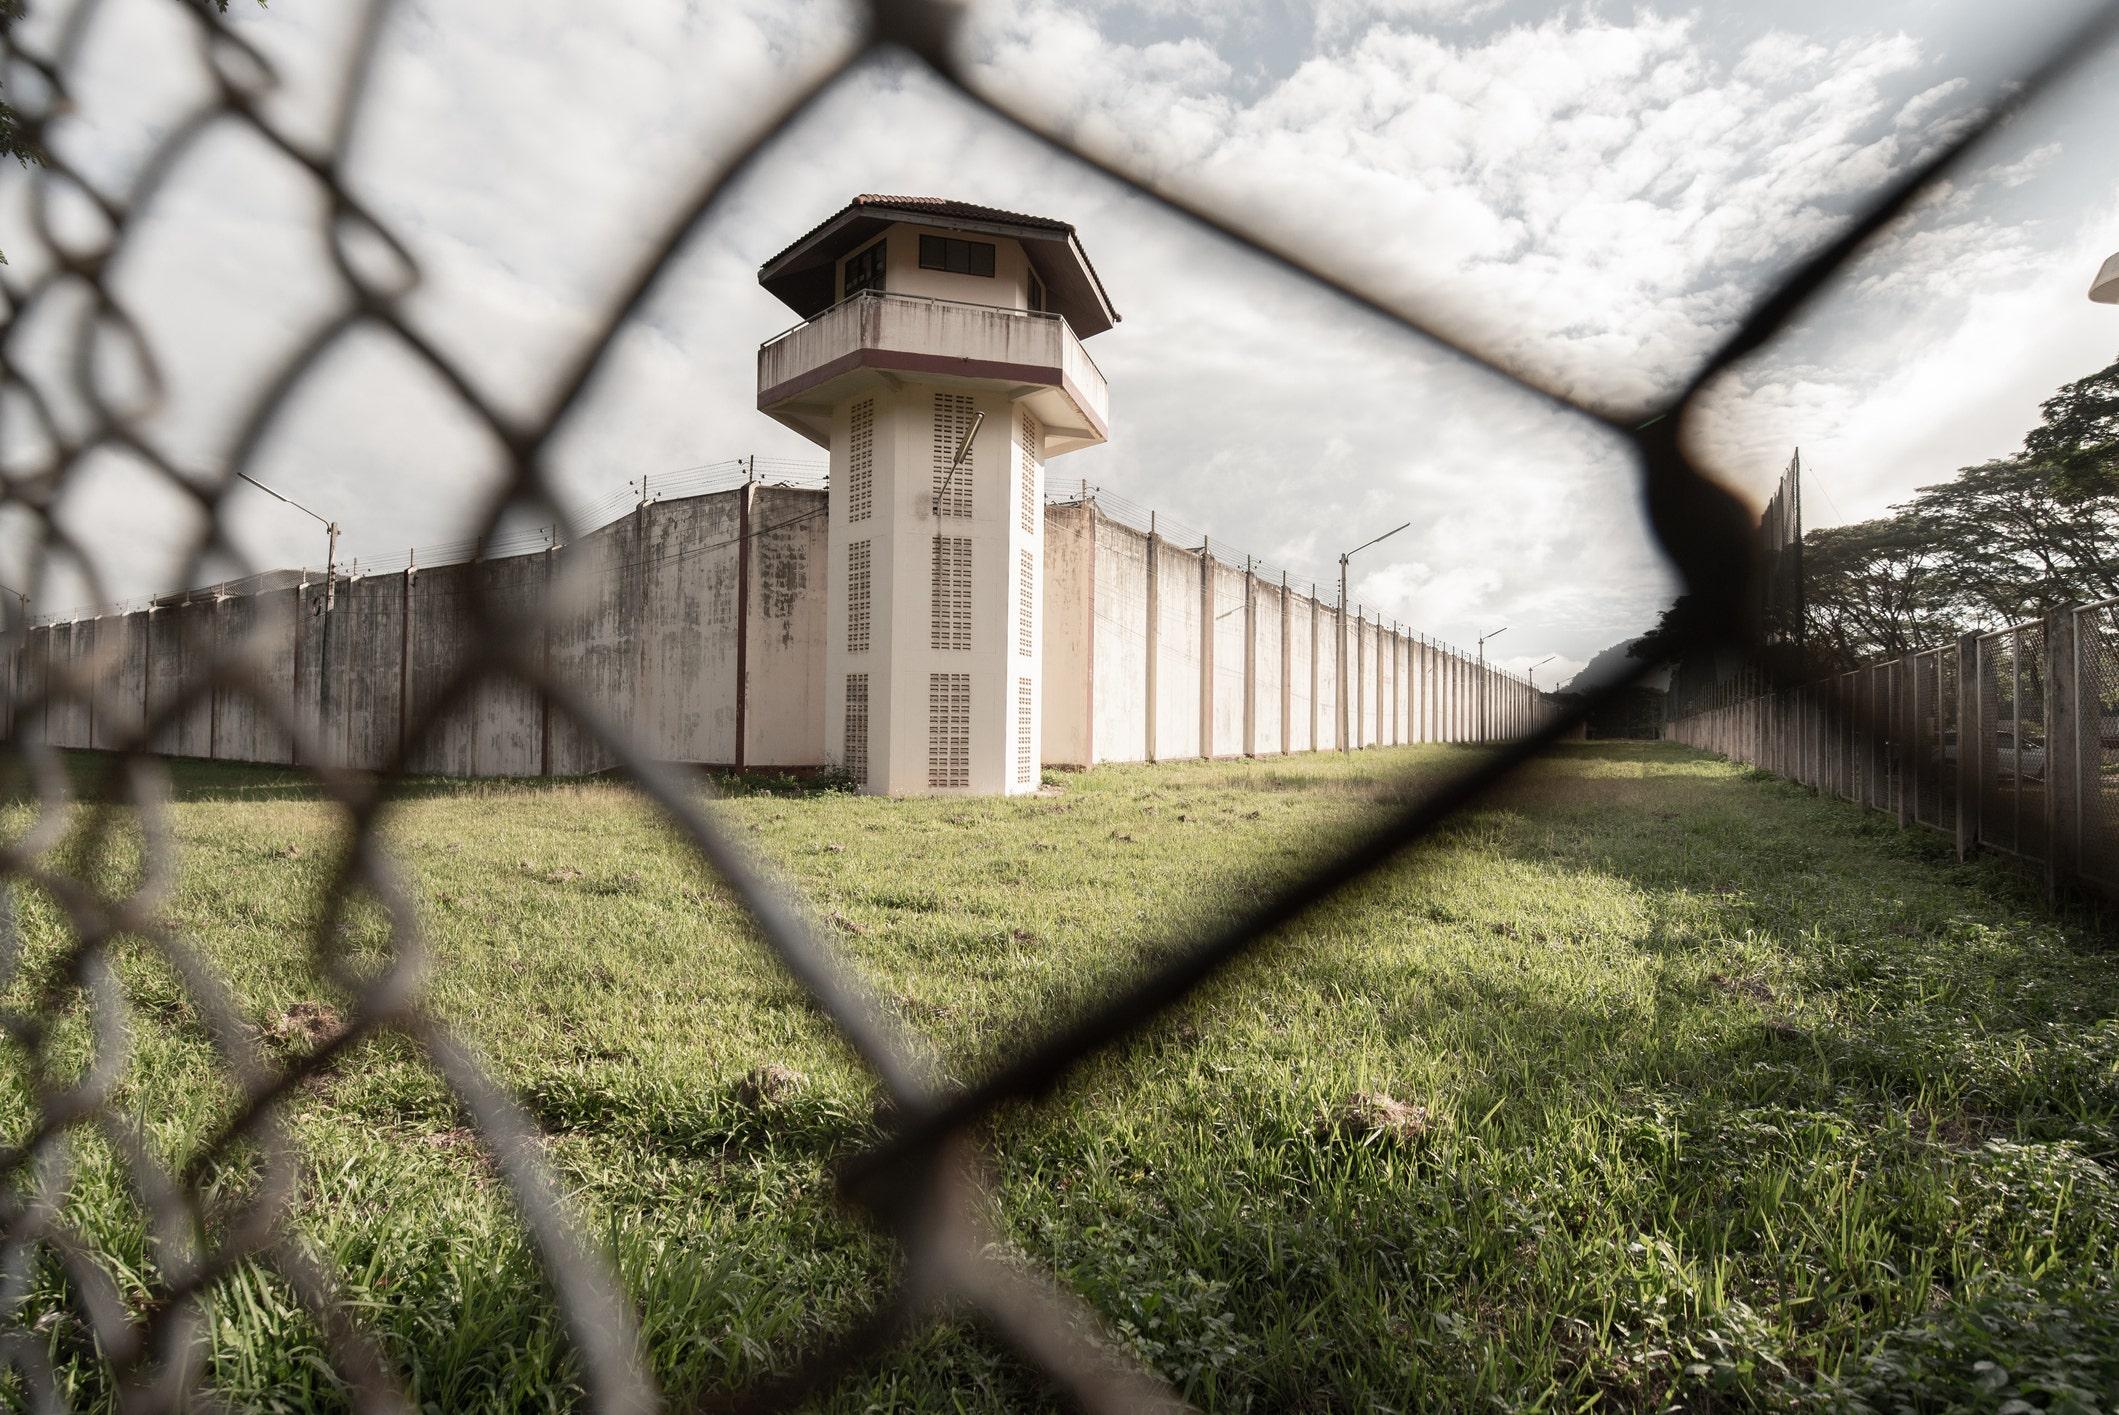 Oregon man gets 'unheard of' 275-year sentence for child sex crimes